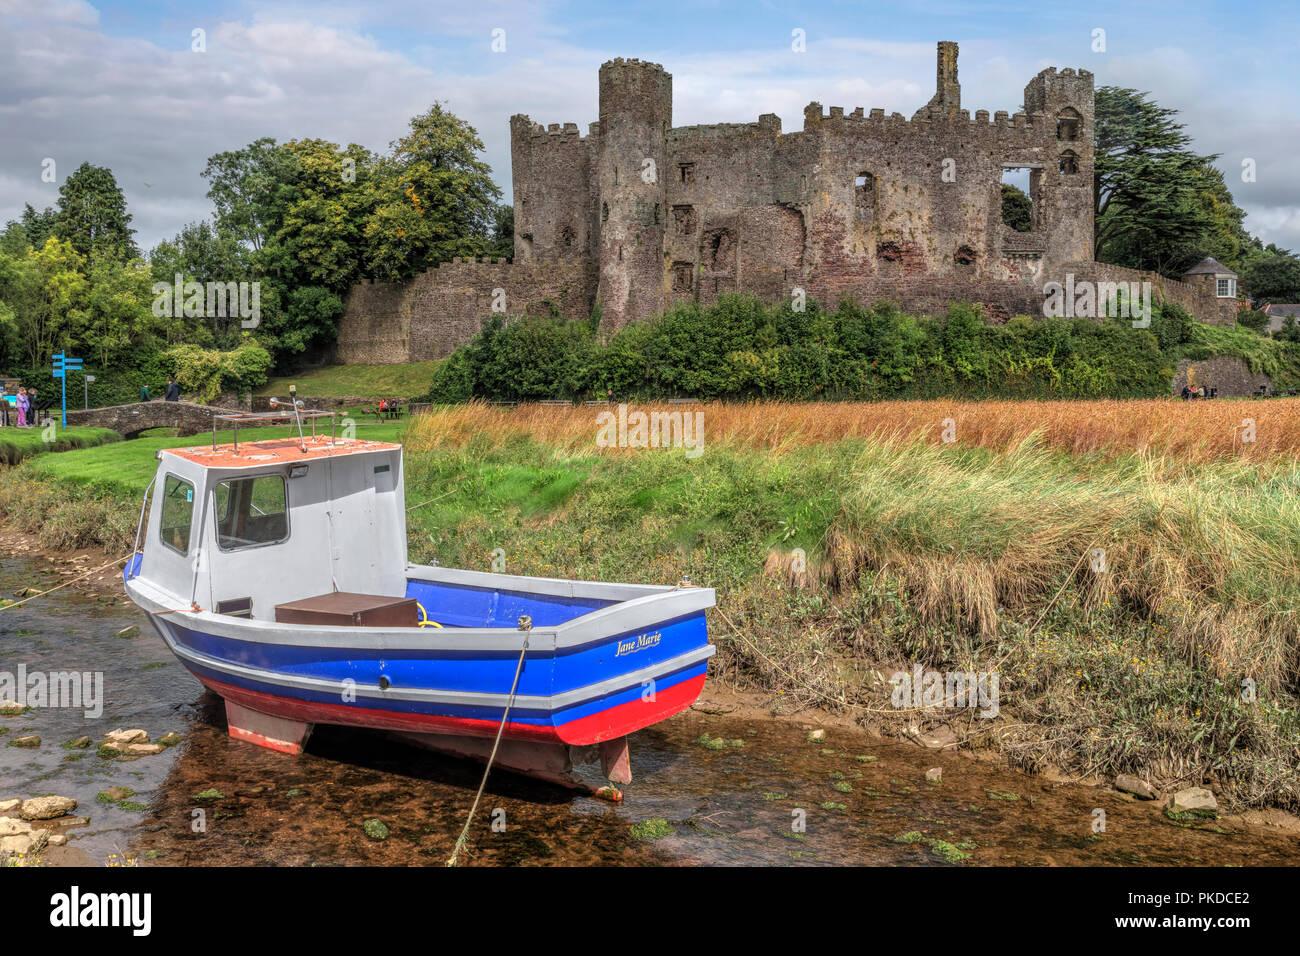 Laugharne Castle, Carmarthenshire, Wales, UK, Europe - Stock Image